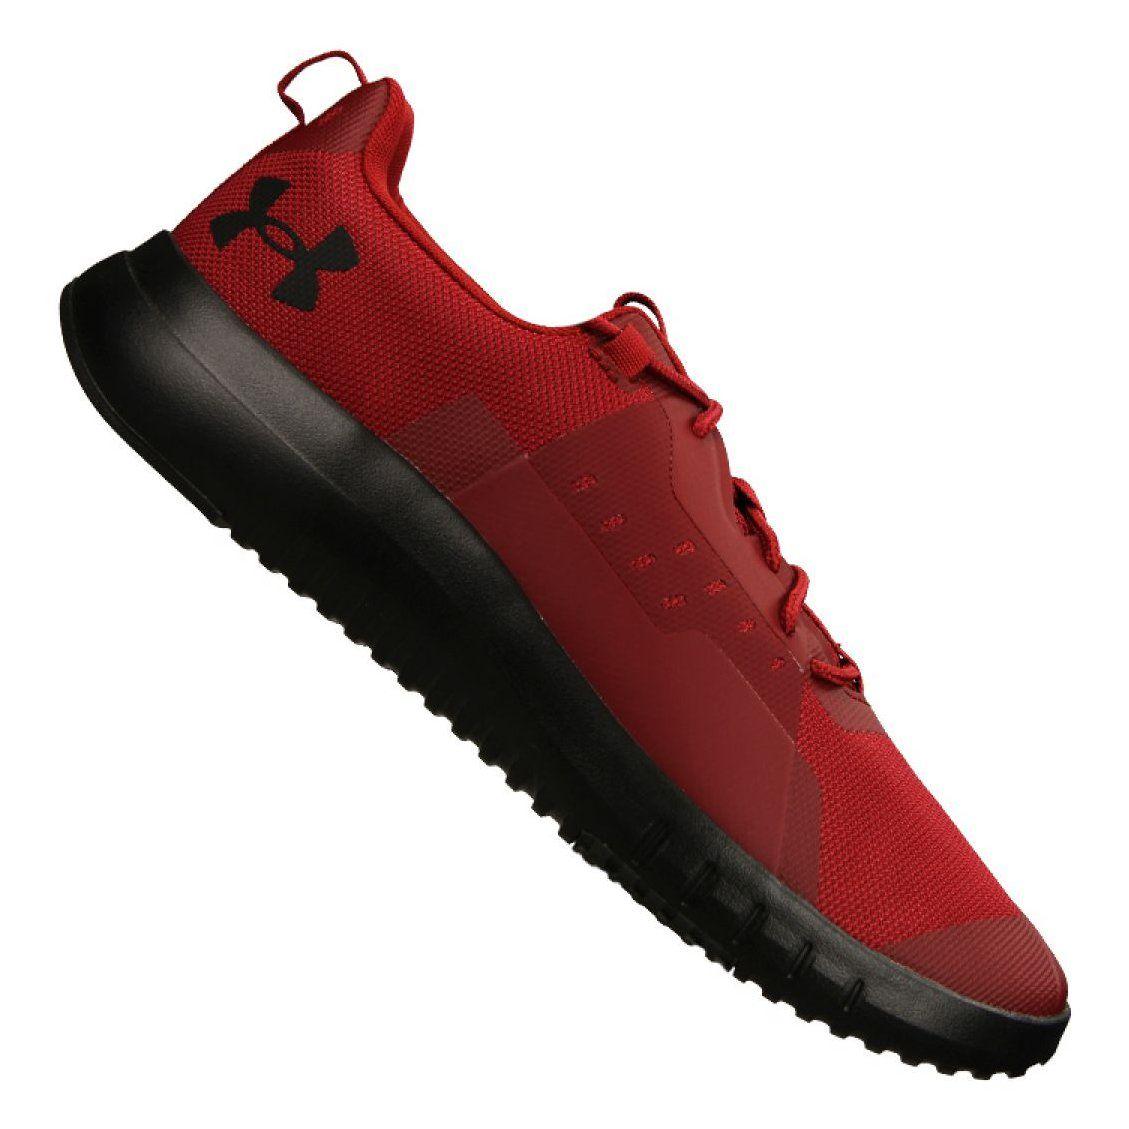 Buty Treningowe Under Armour Tr96 M 3021296 600 Czerwone Training Shoes Under Armor Under Armour